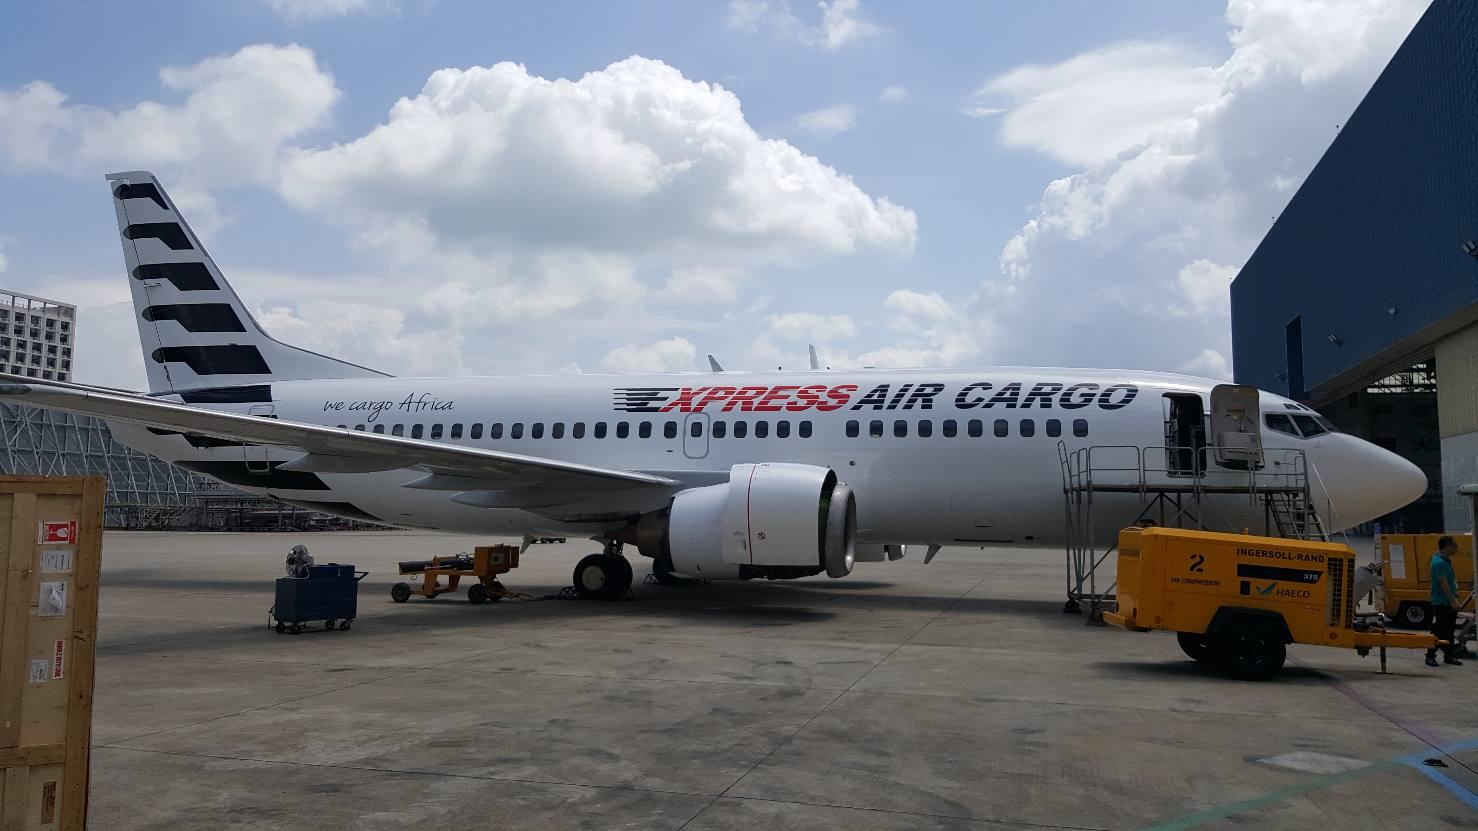 Express Air Cargo garde ses ambitions intactes